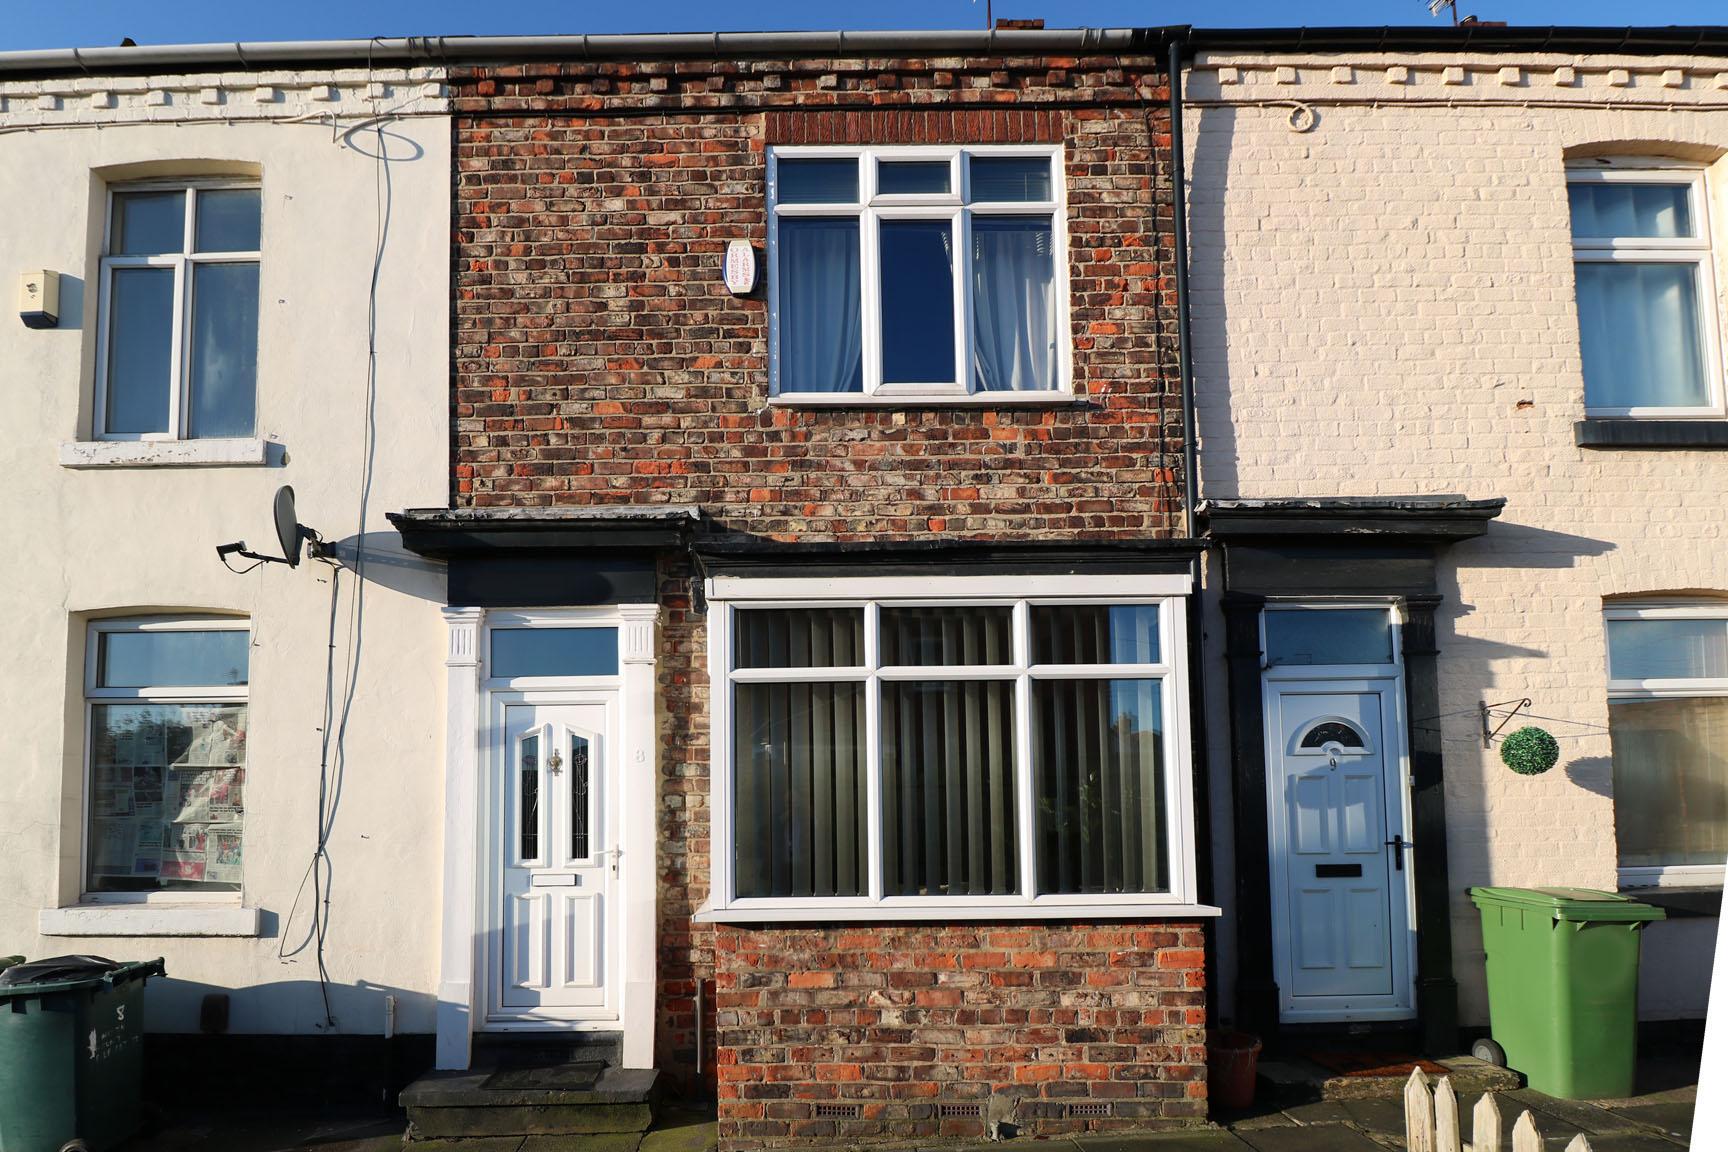 Home for Sale Let - Photo 01 North Mount Pleasant Street, Norton, Stockton on Tees, TS20 2JA